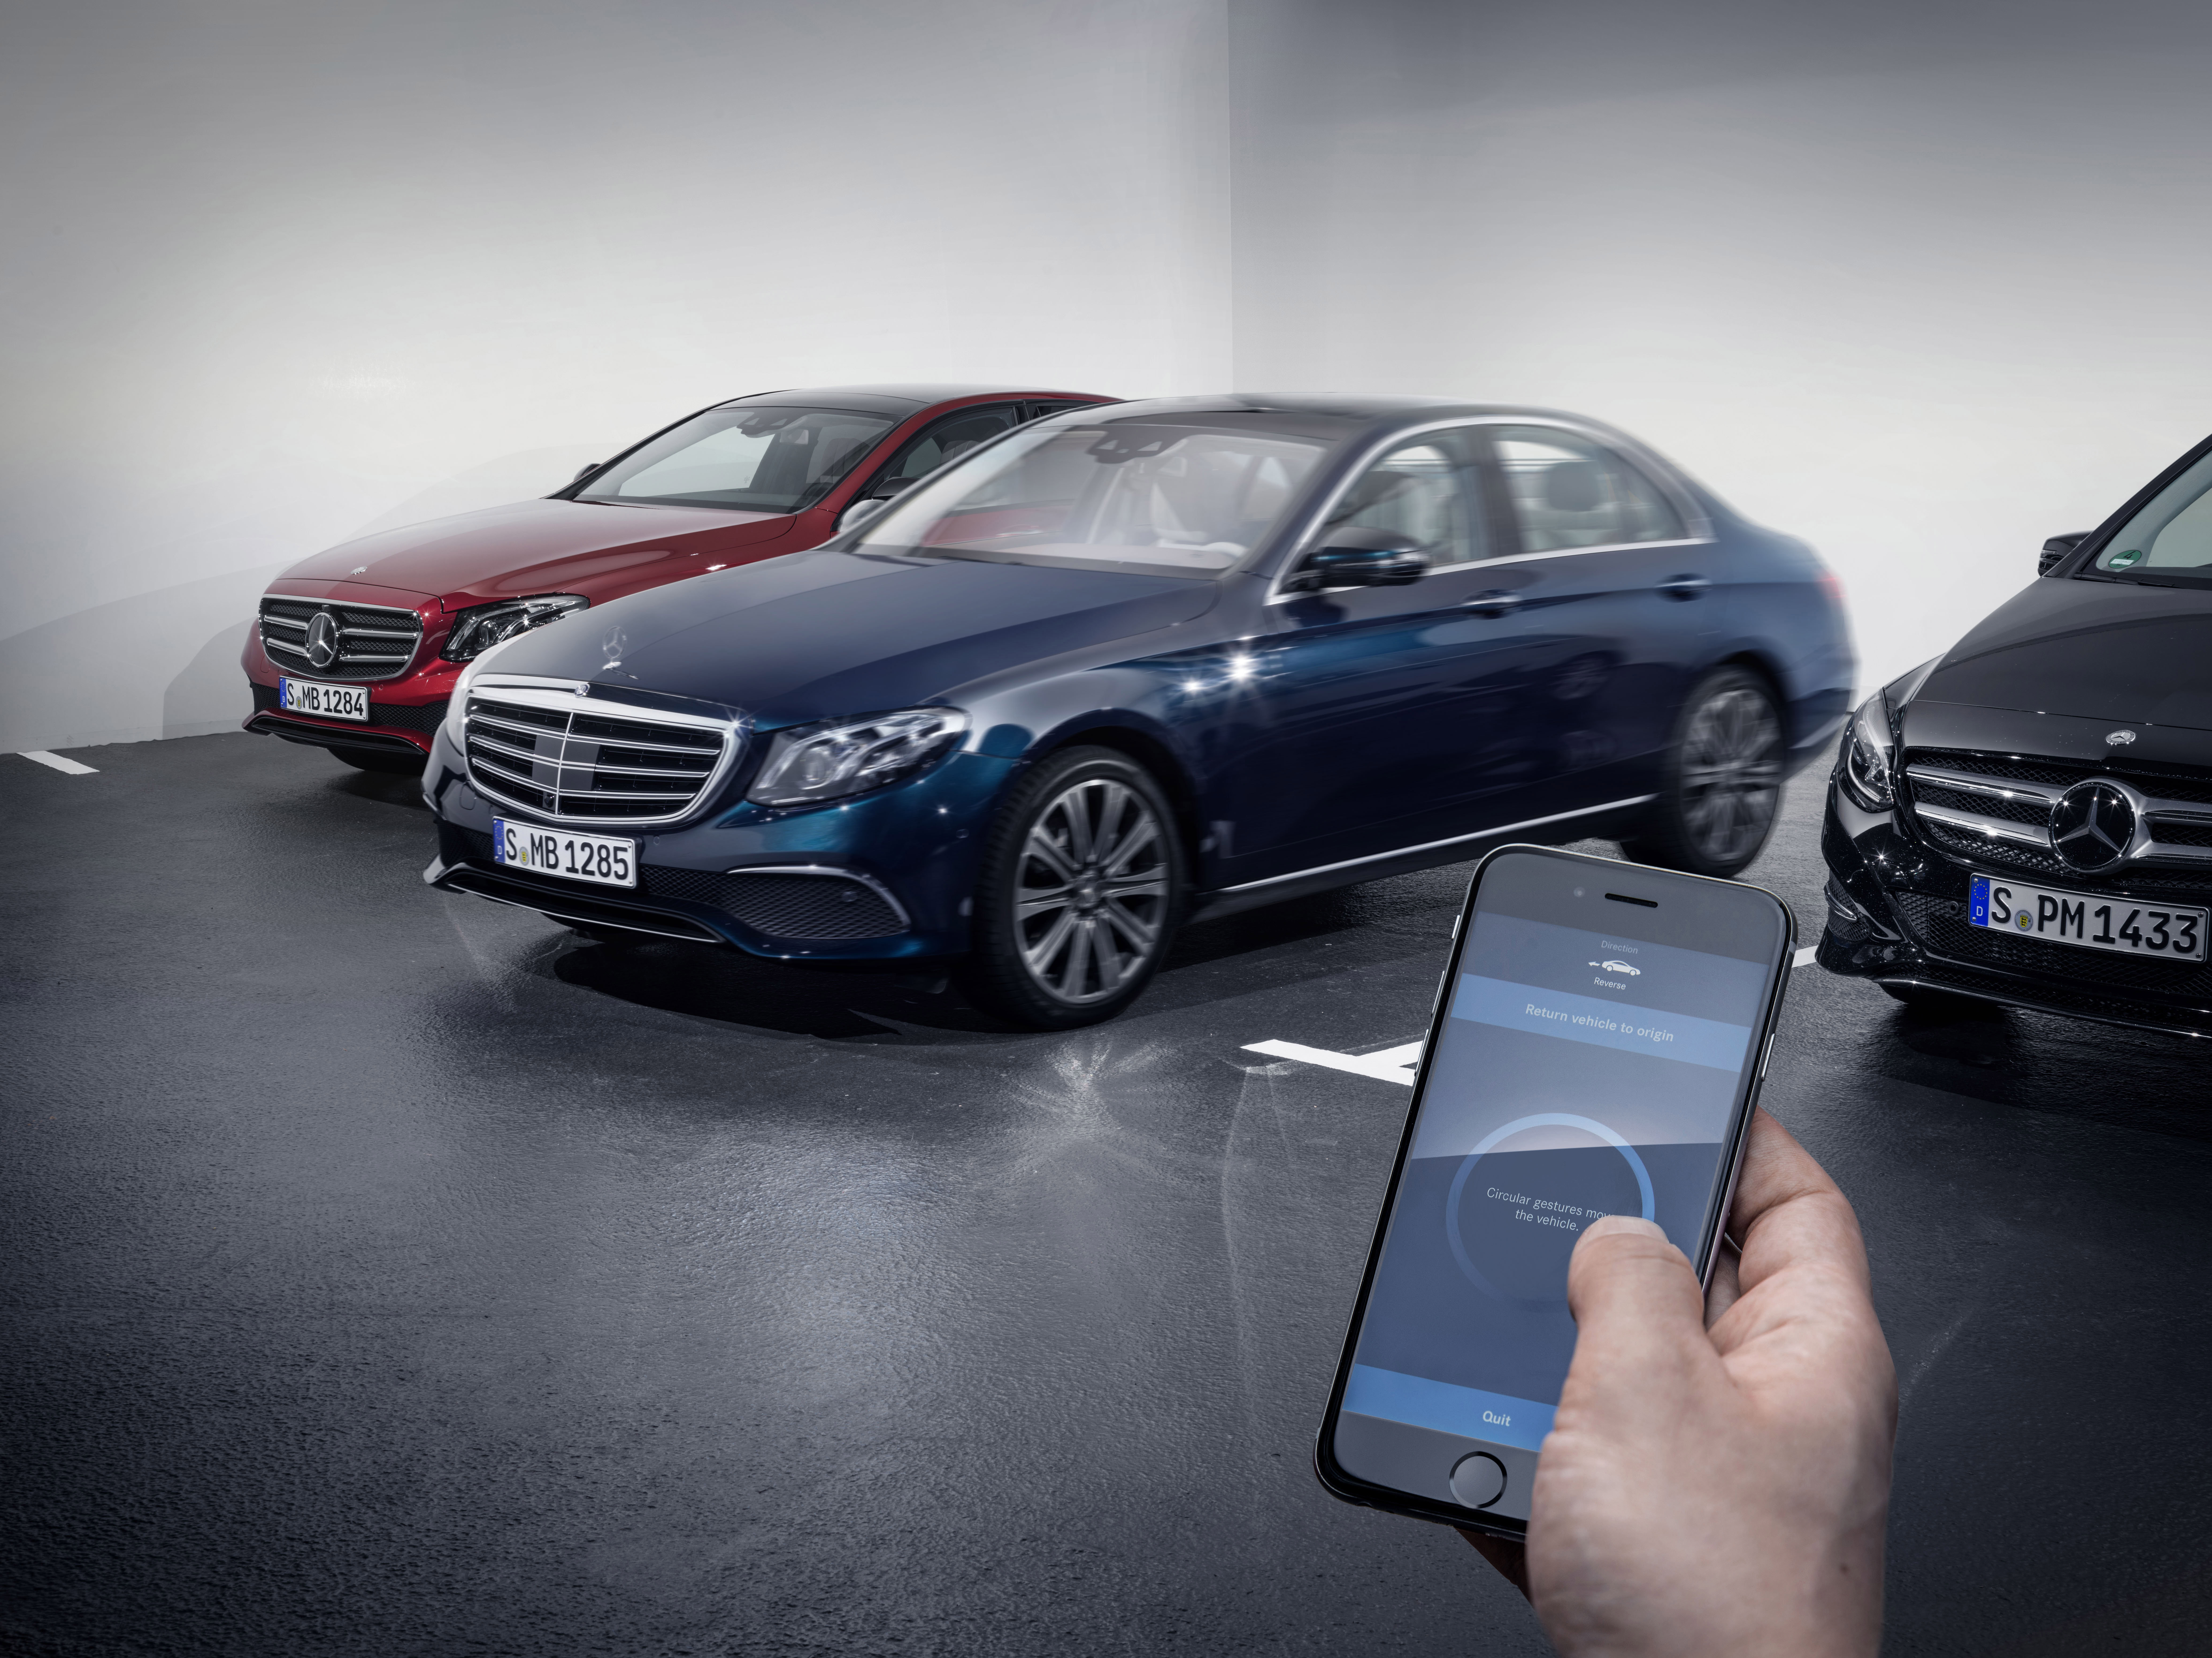 Remote parking mercedes benz for Mercedes benz parking